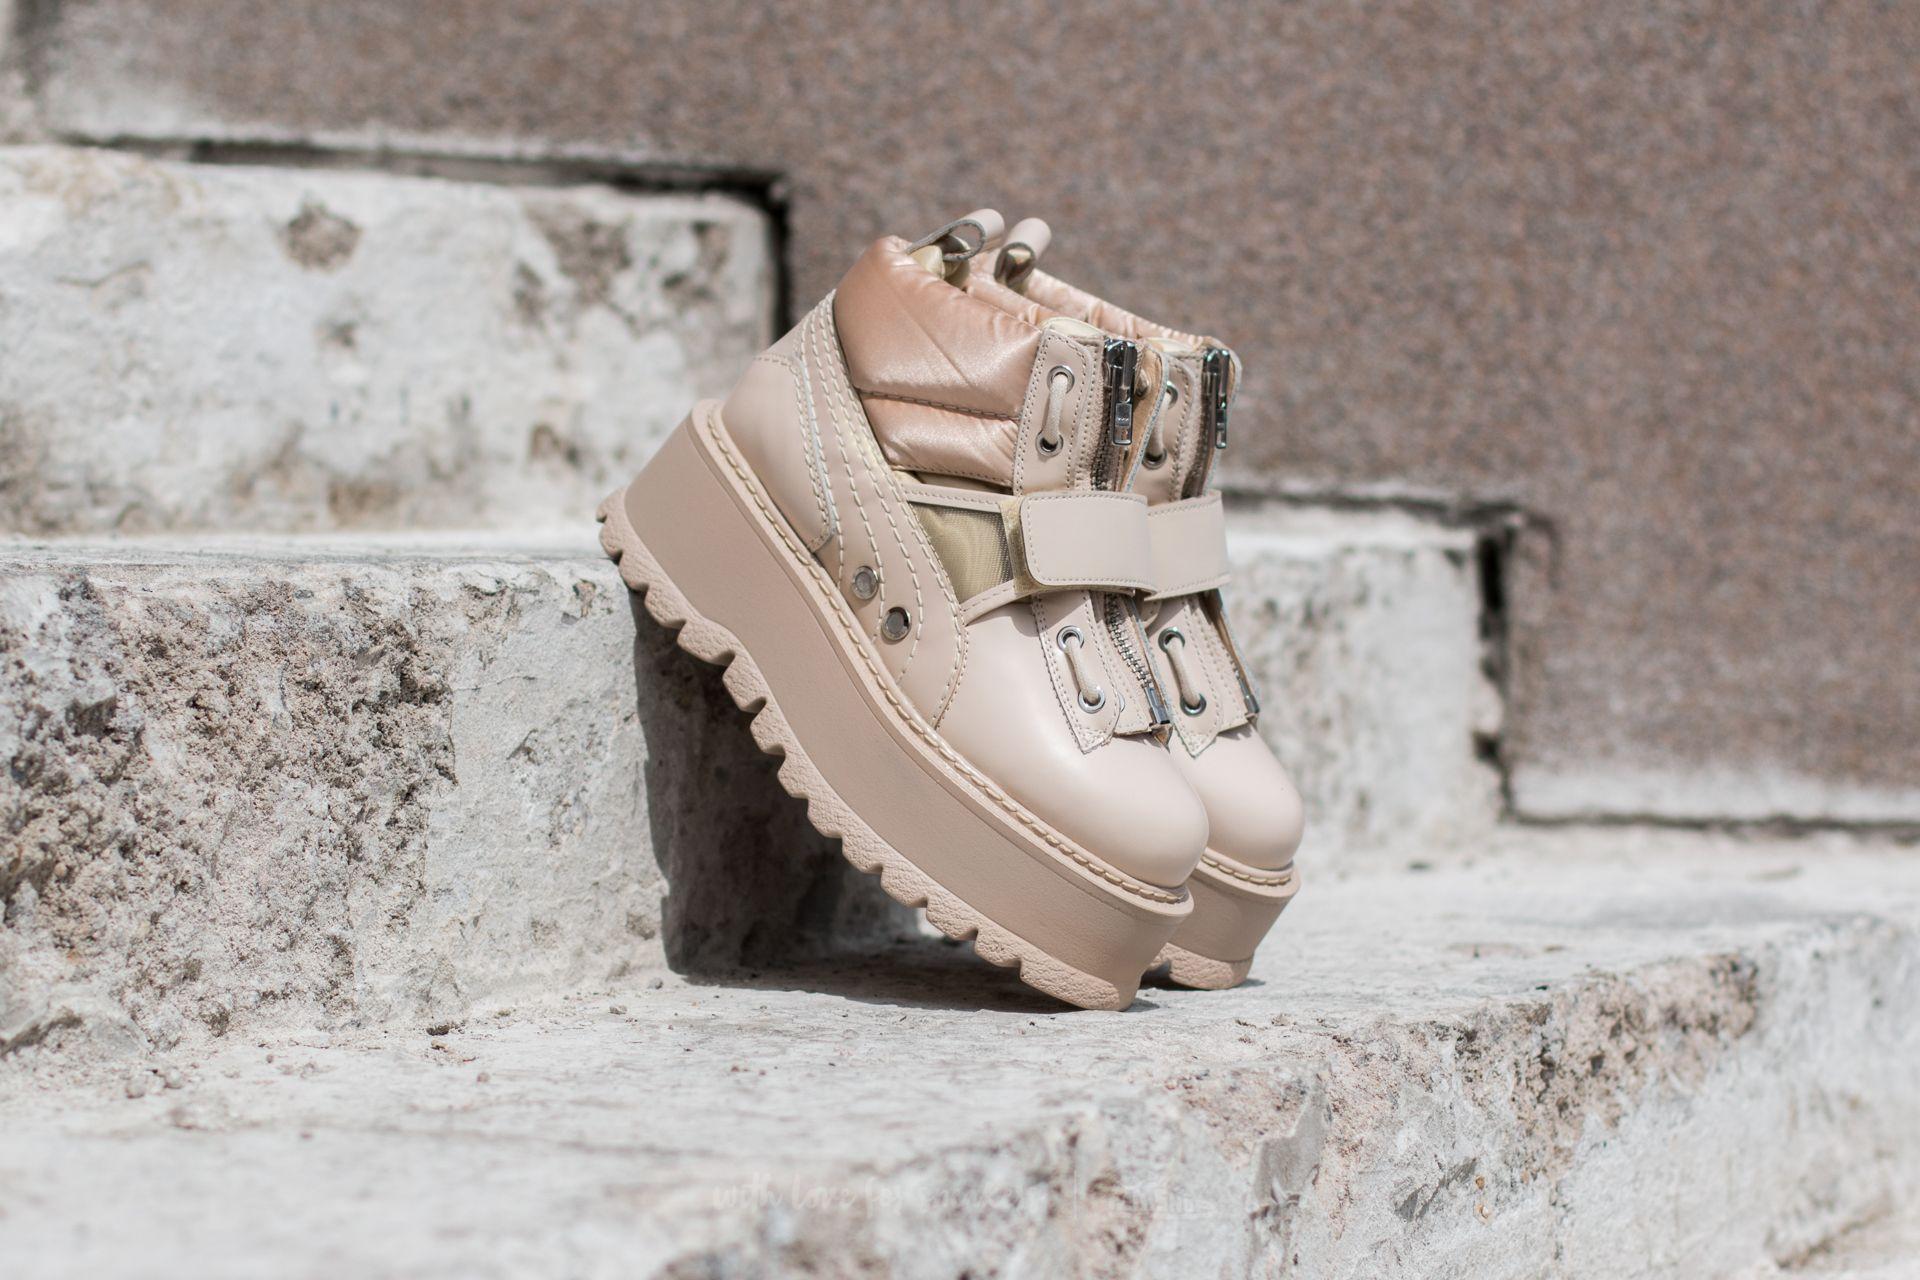 new product 52894 26f5a Puma FENTY Sneaker Boot Strap Wns Pink Tint-Pink Tint Tint ...